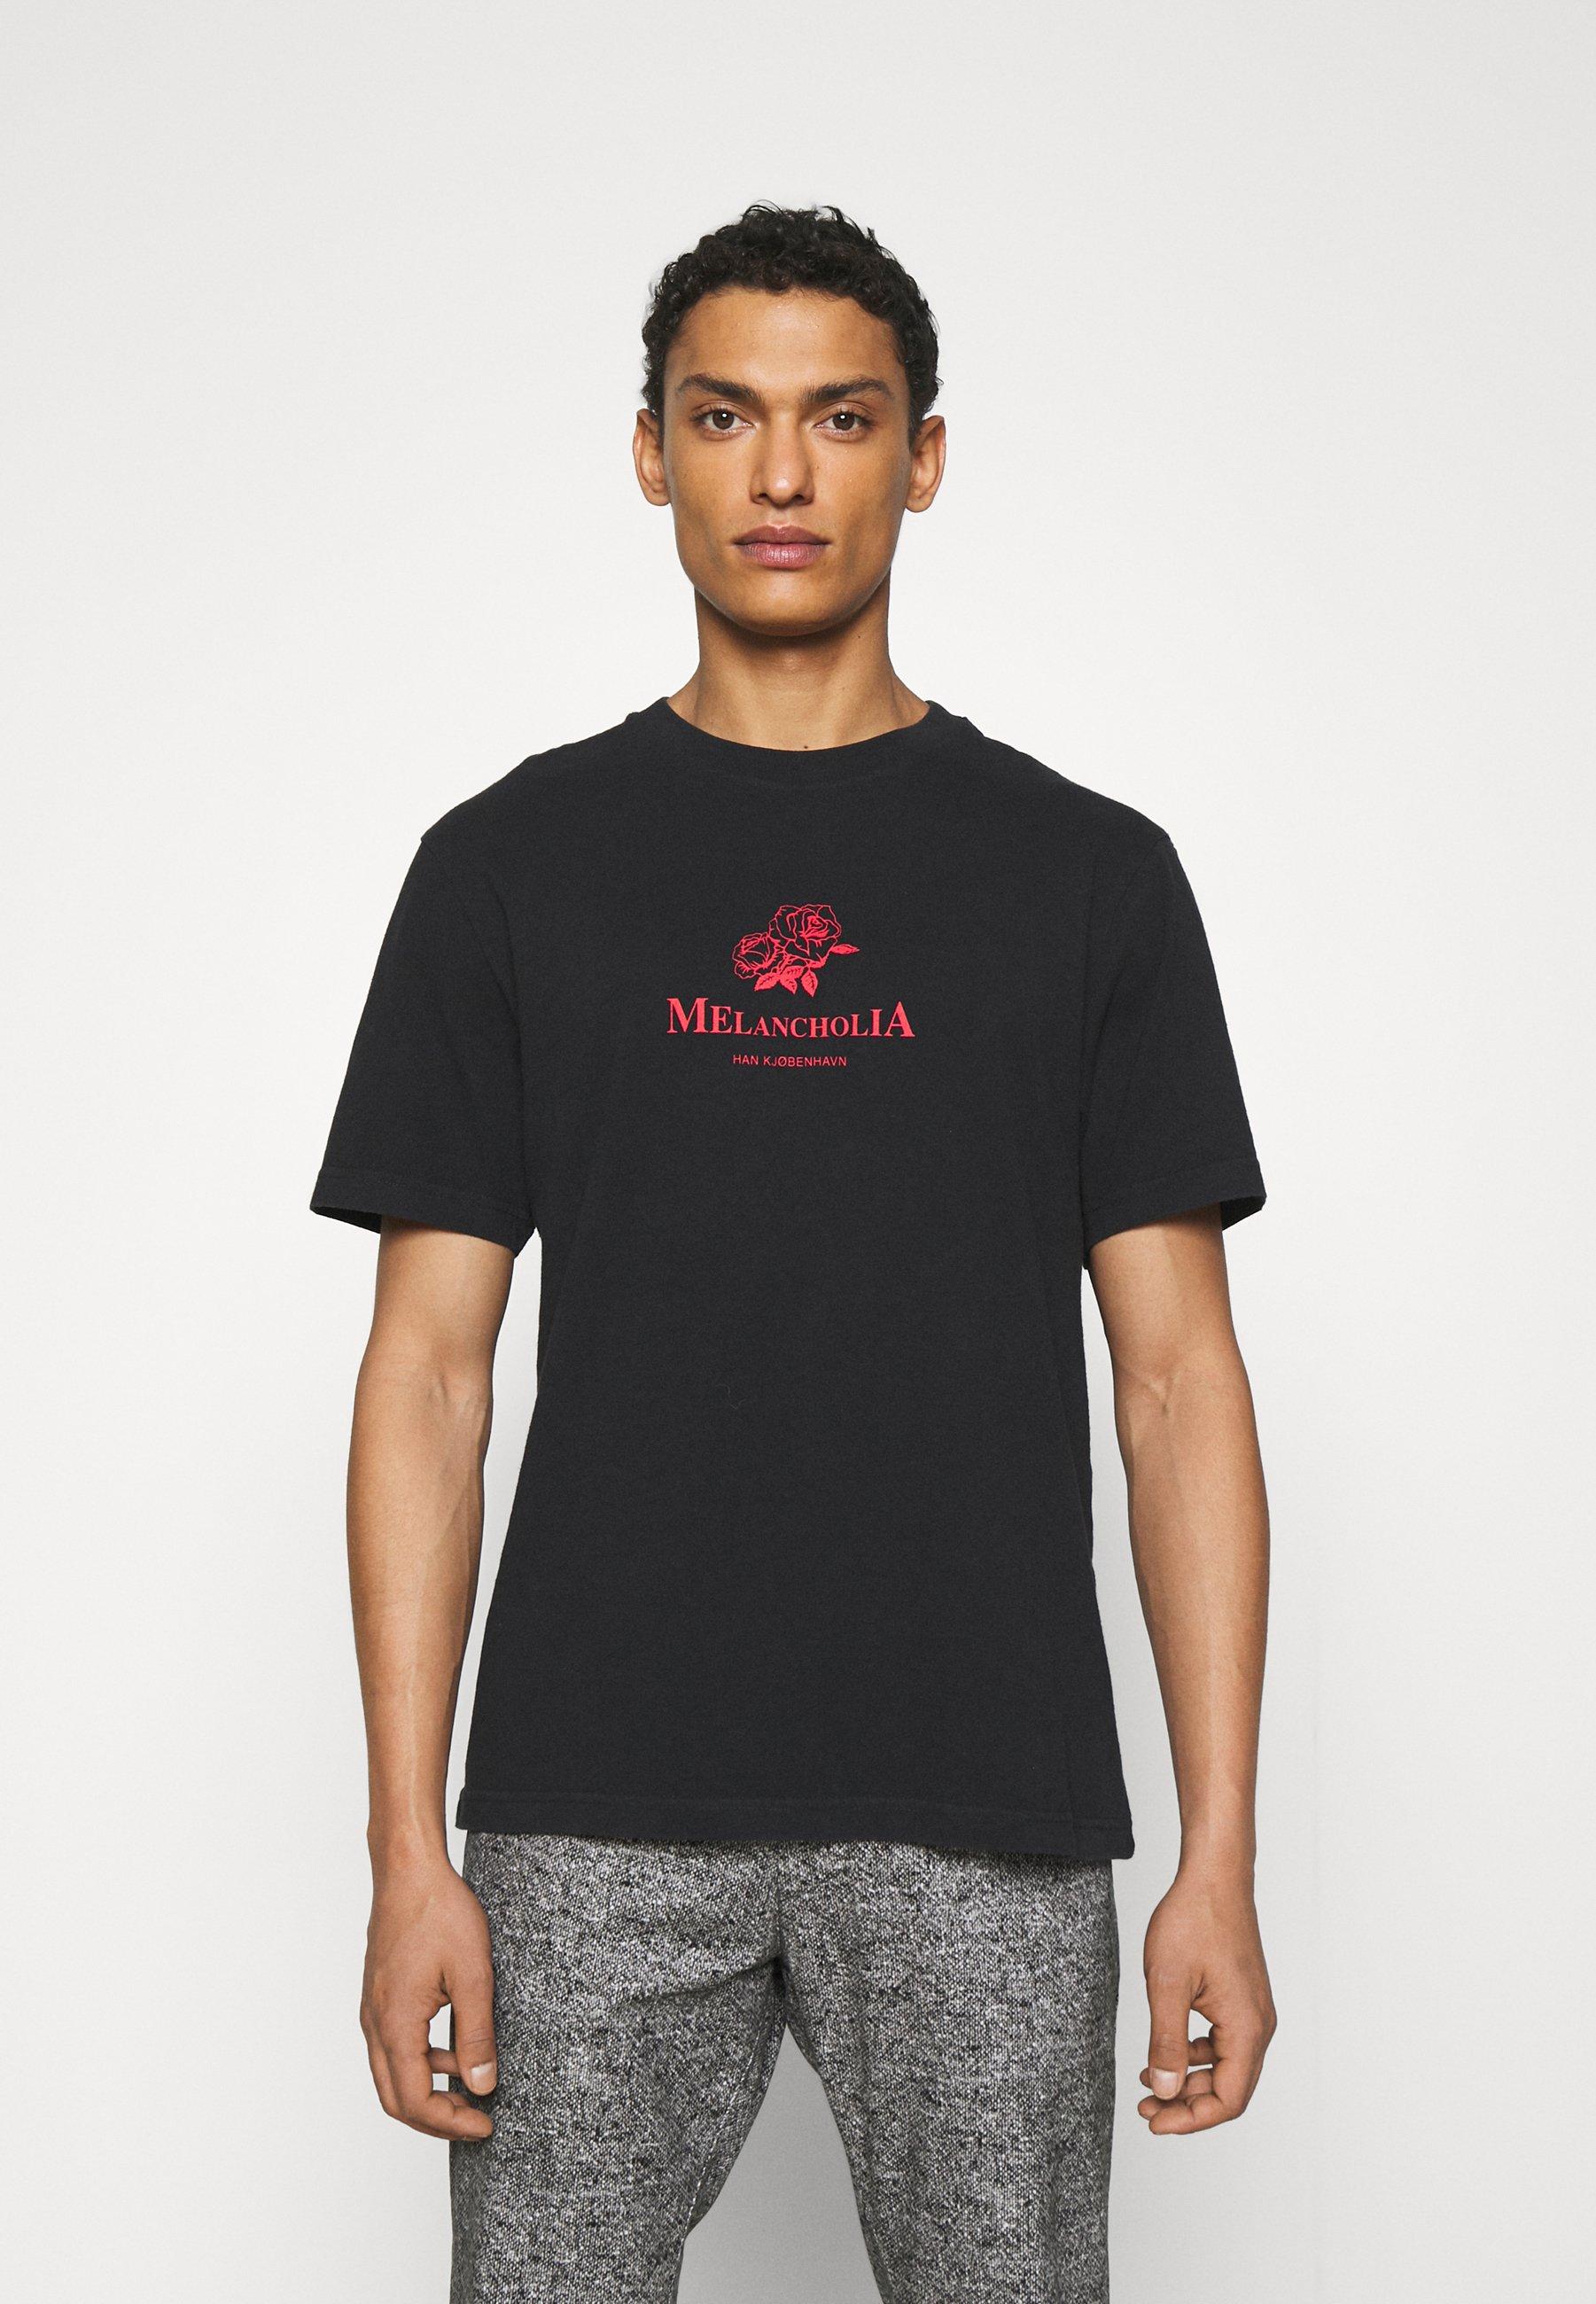 Homme ARTWORK TEE SHORT SLEEVE - T-shirt imprimé